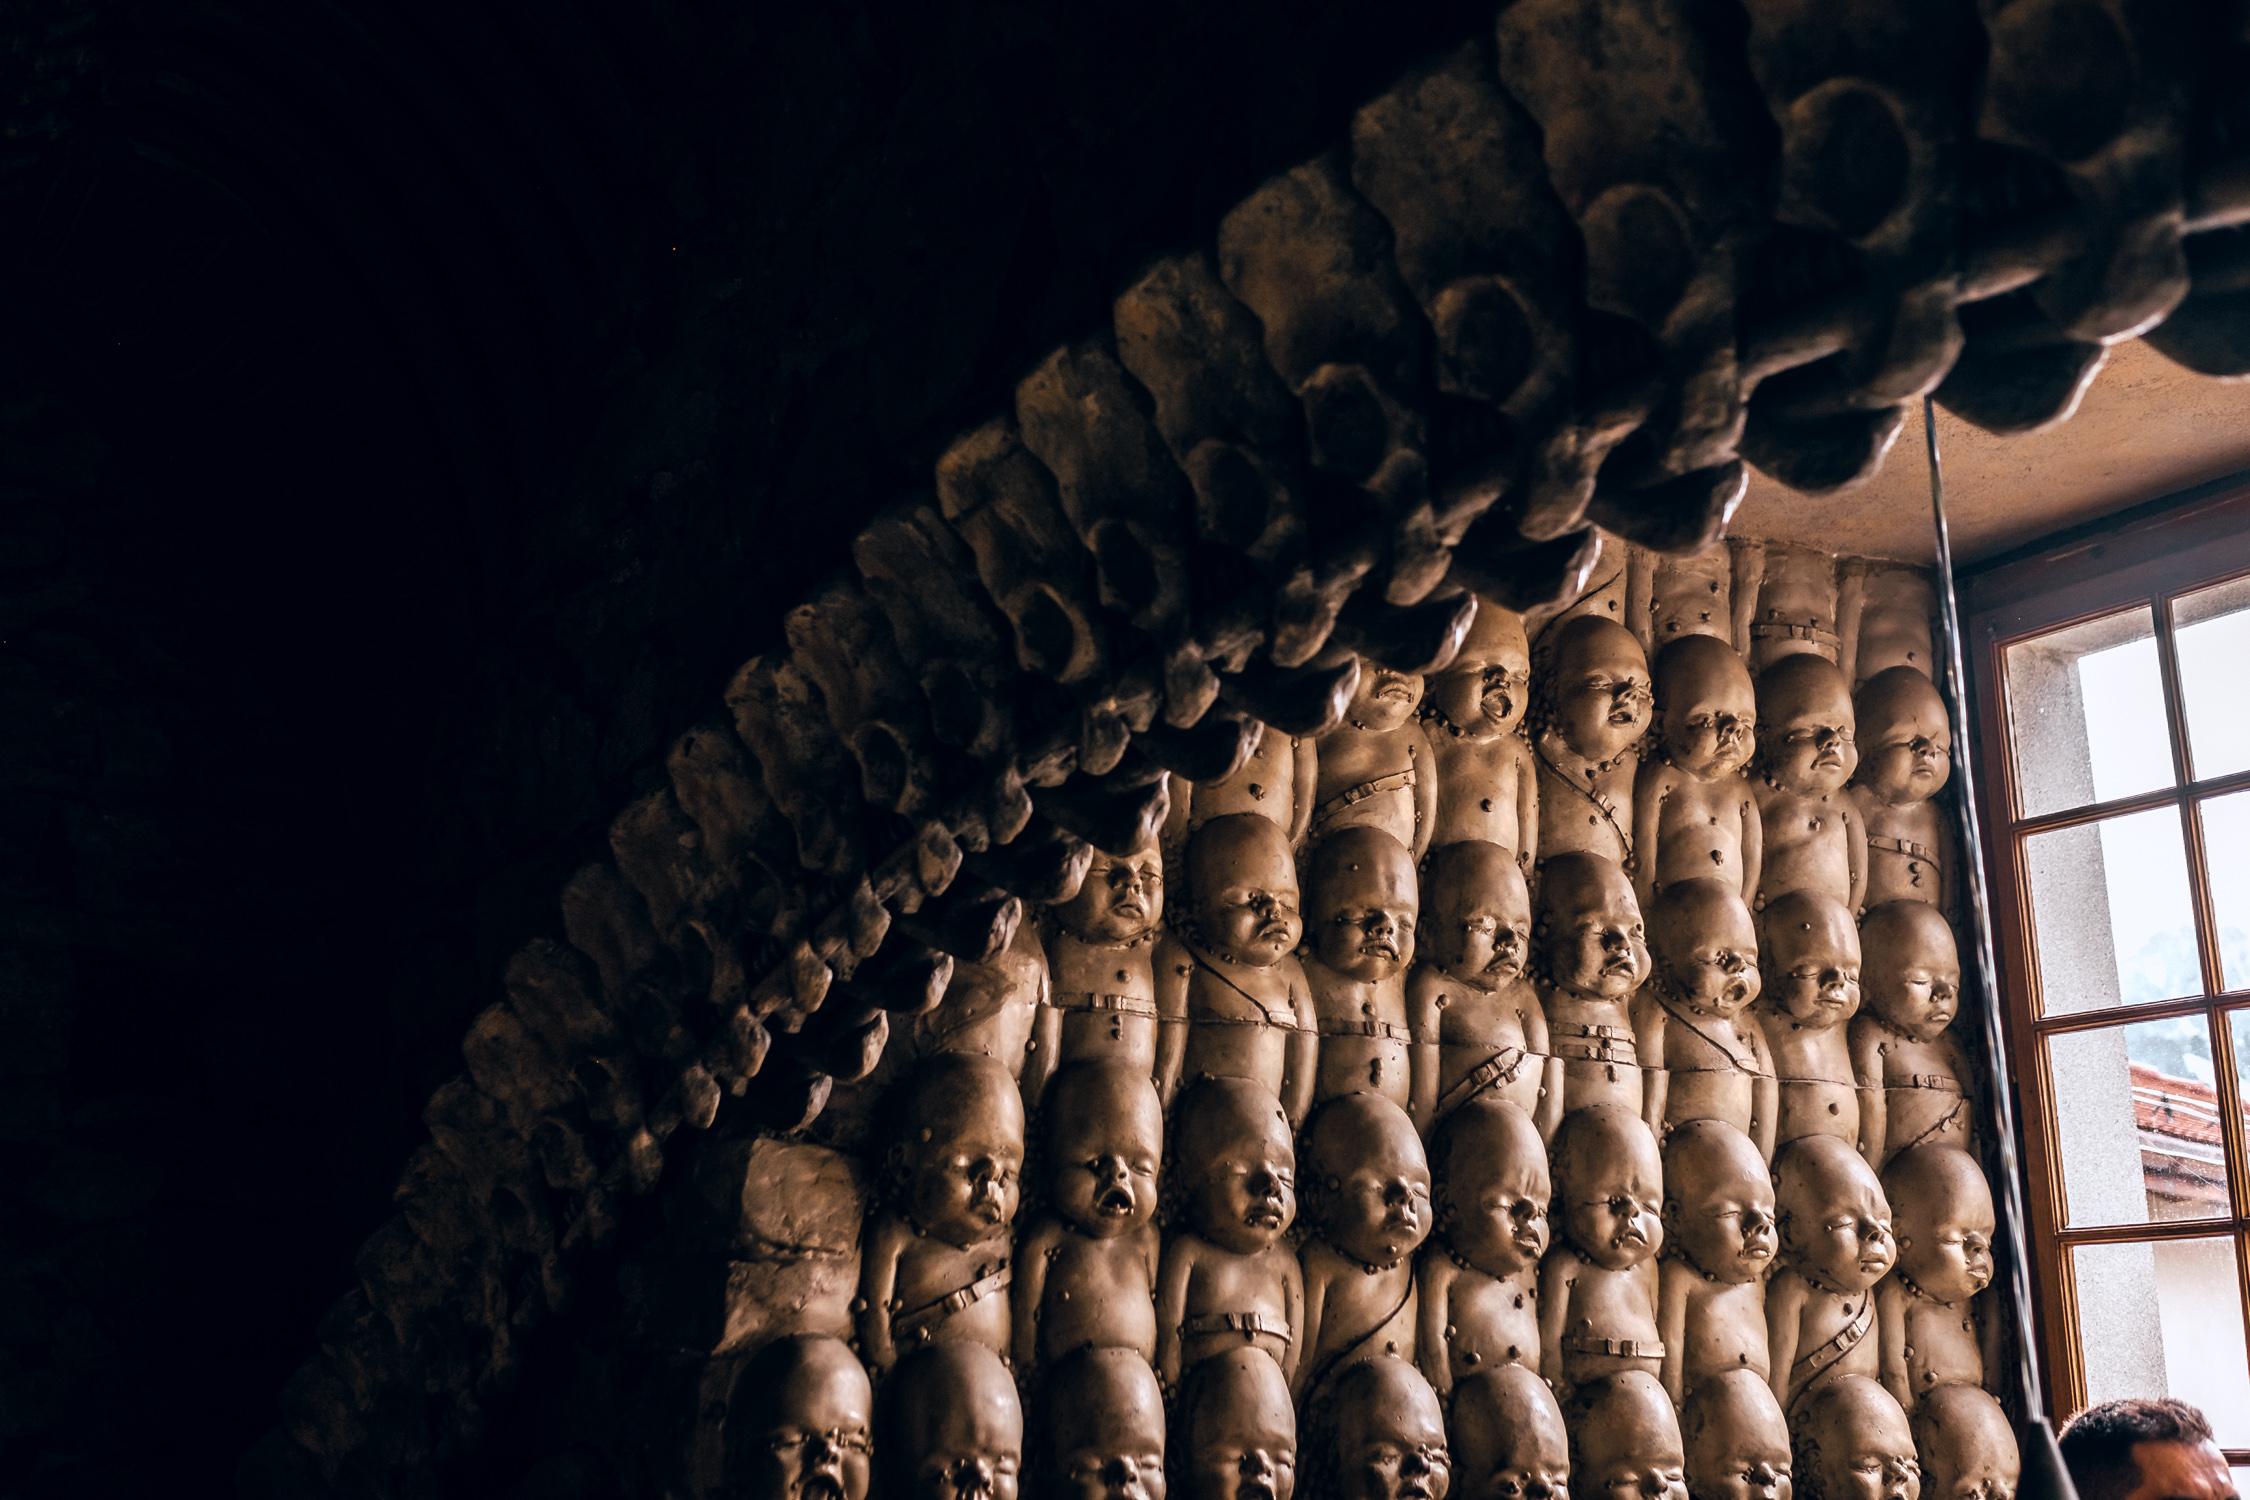 partimetravelers travel bloggers blog travel switzerland photography winter video ber interlaken lauternbrunen grindwald alien predator bar